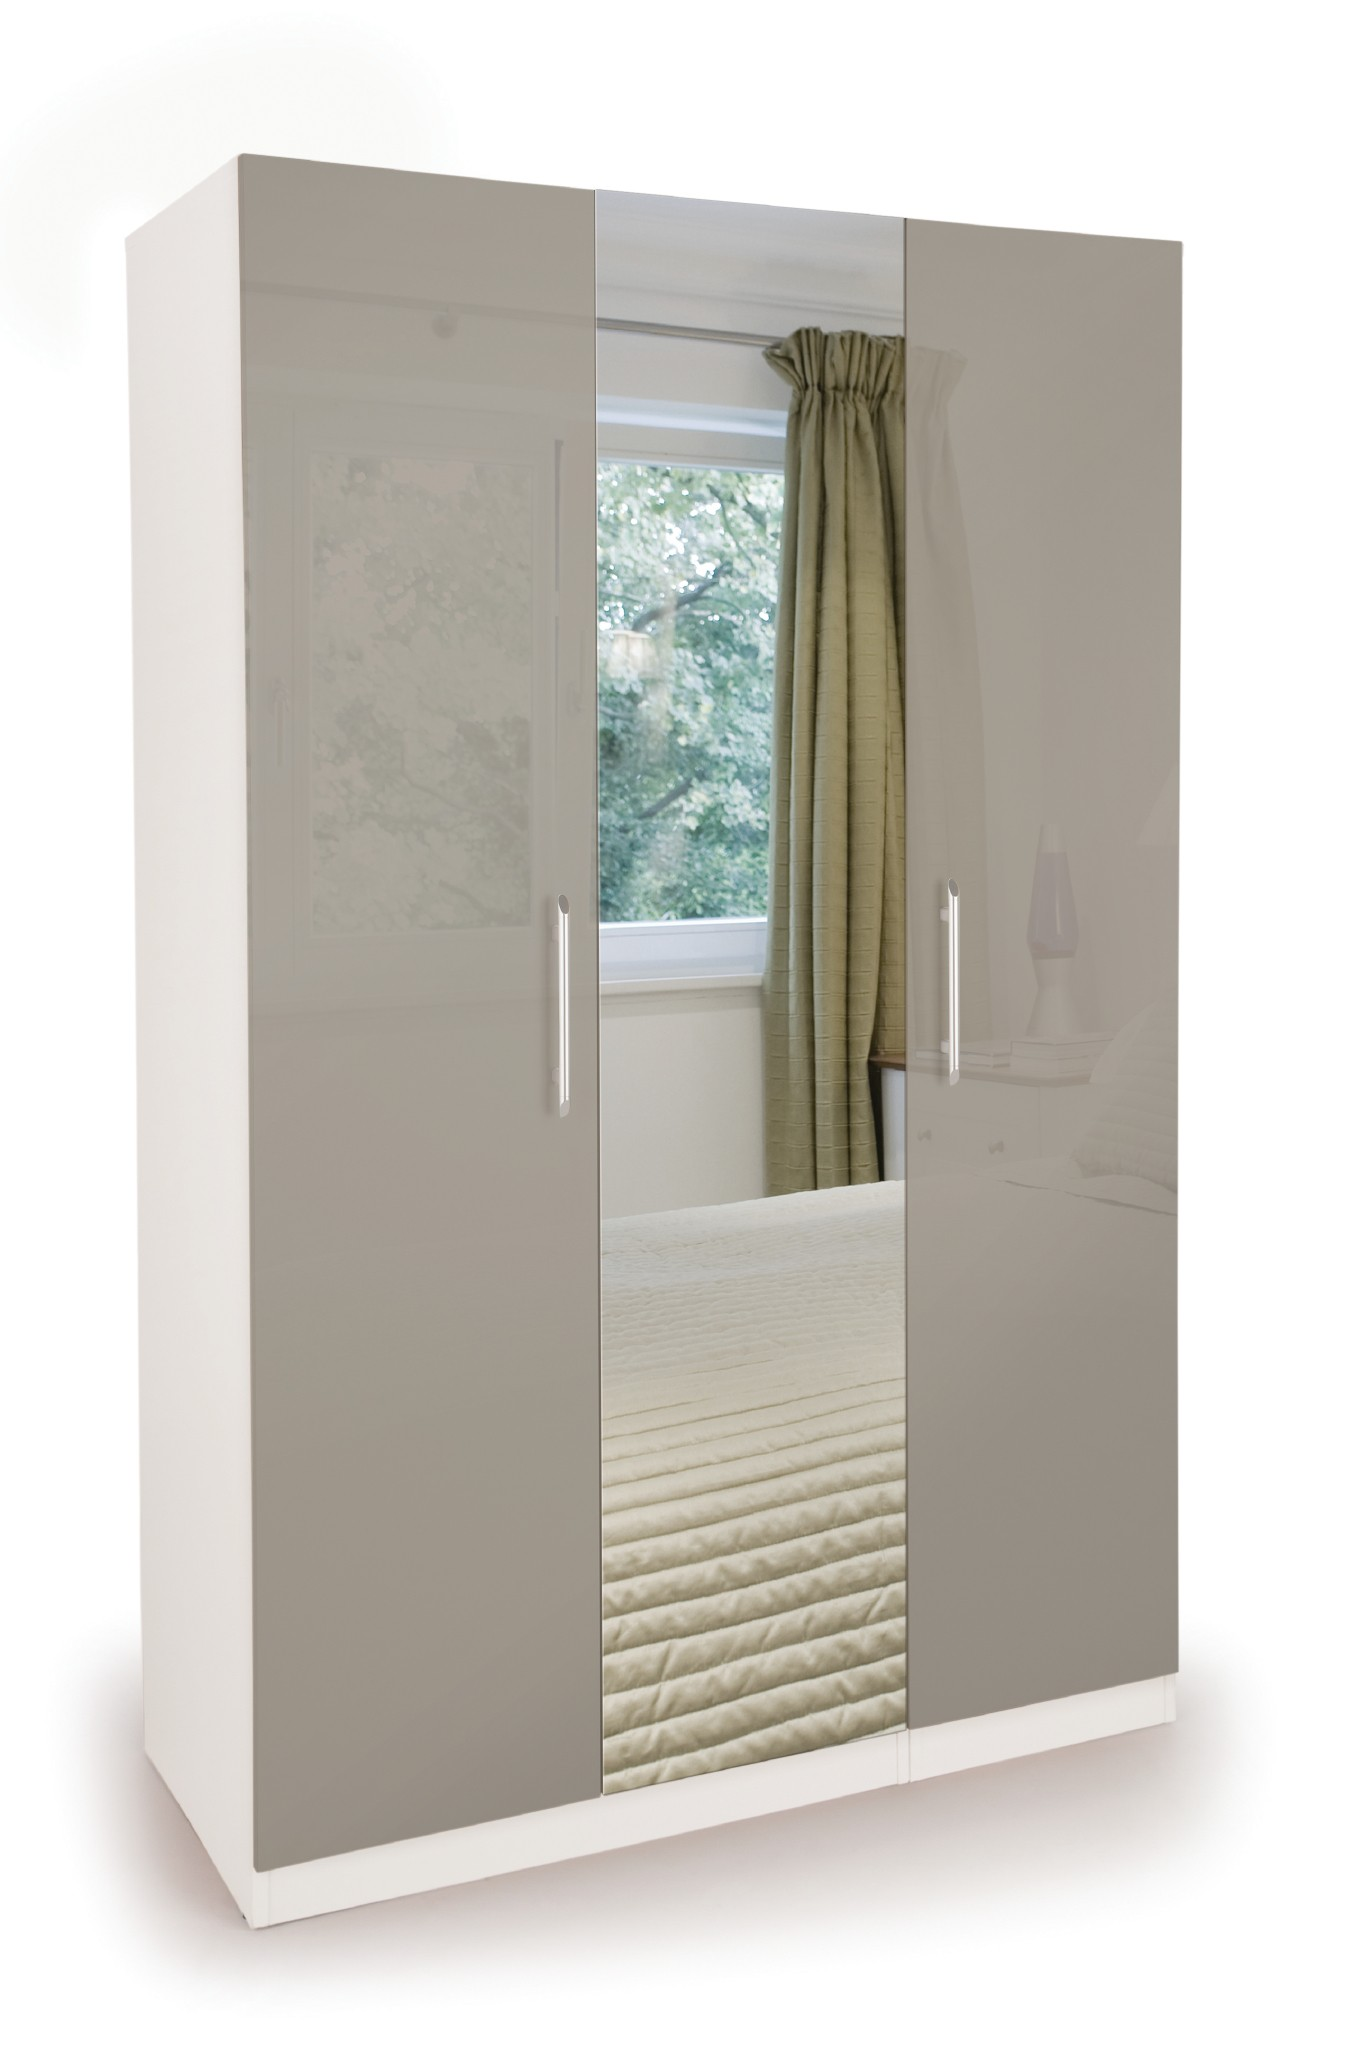 Connect Bayswater 3 Door Wardrobe with Mirror